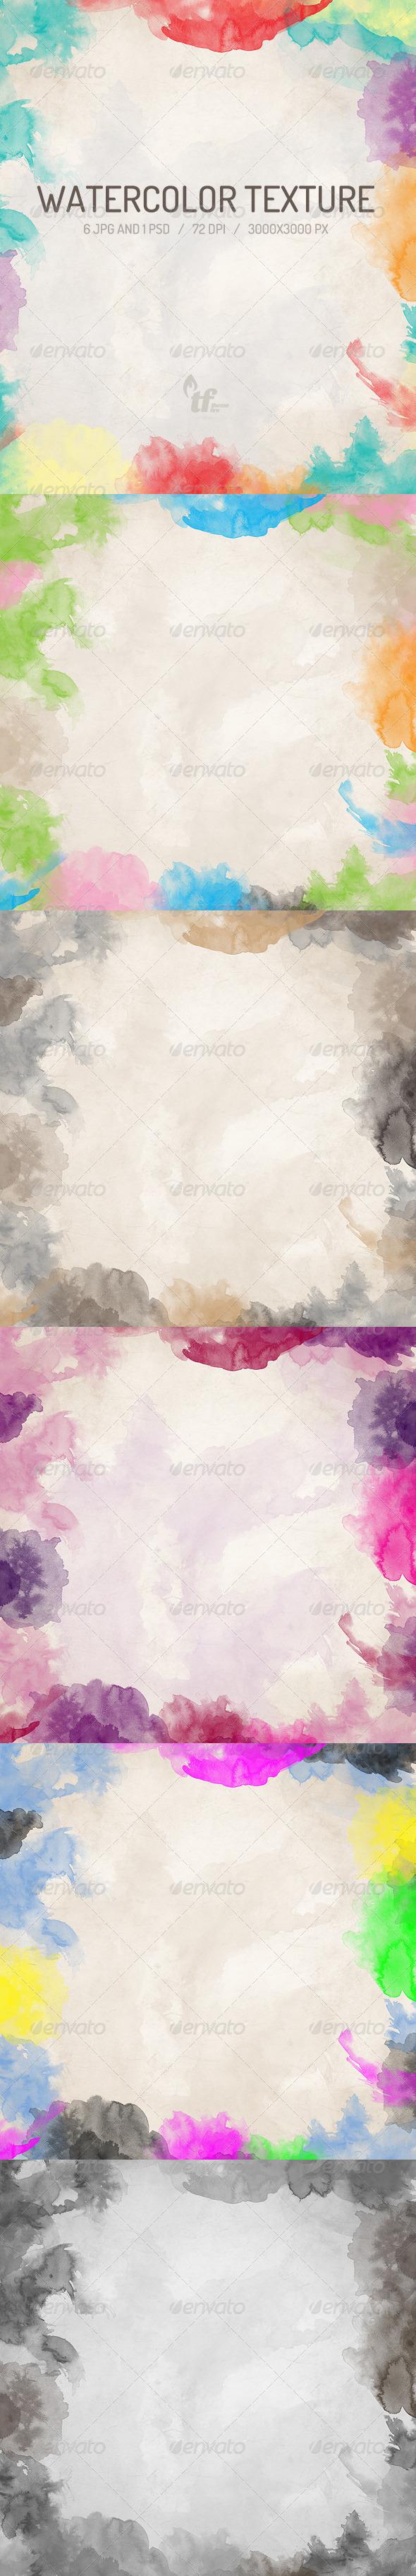 GraphicRiver Watercolor Texture 6777907